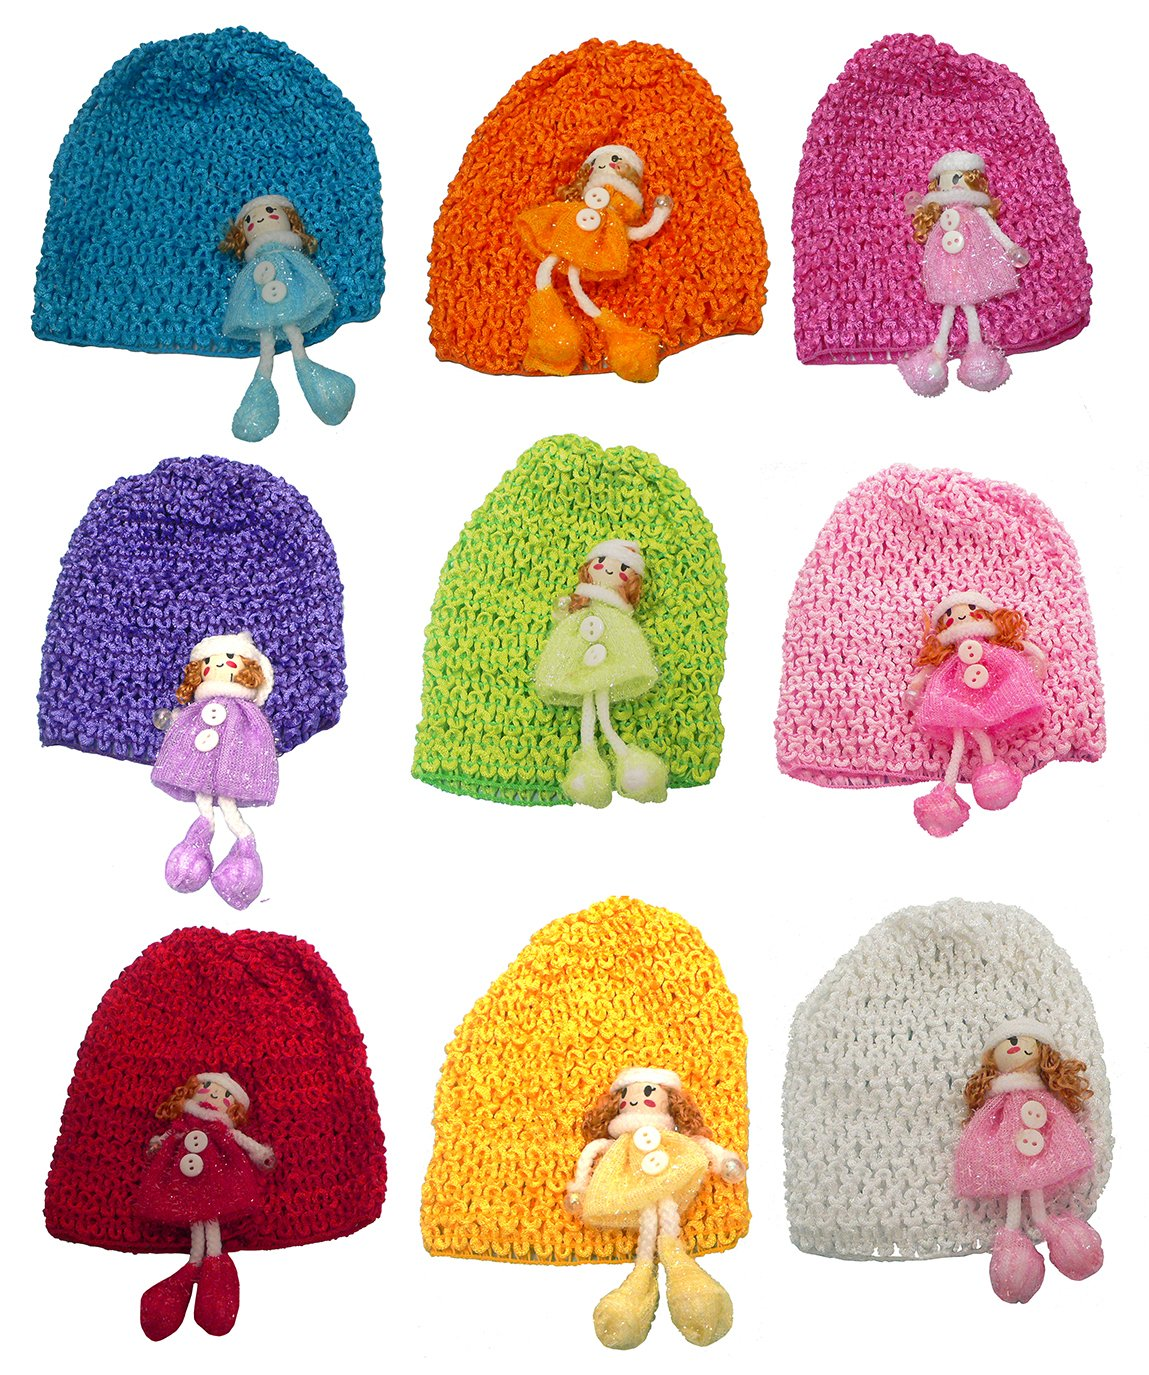 Bella Set of 9 Toddler Knitted Bonnets Baby Girl Hats U16250-0018-9